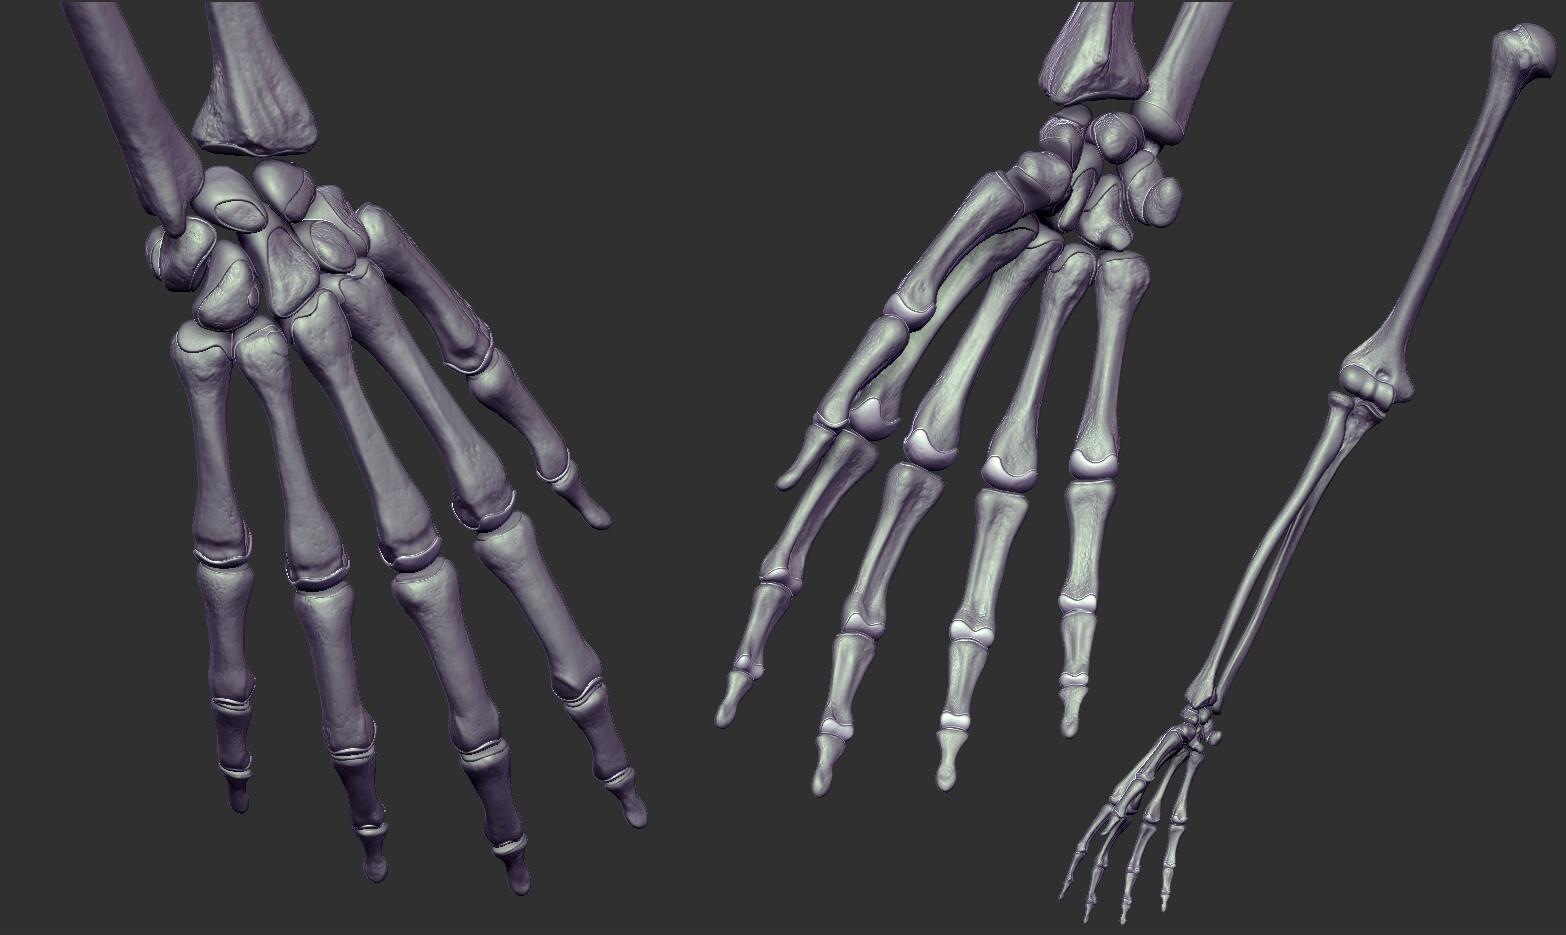 Andrey gritsuk hand 1s